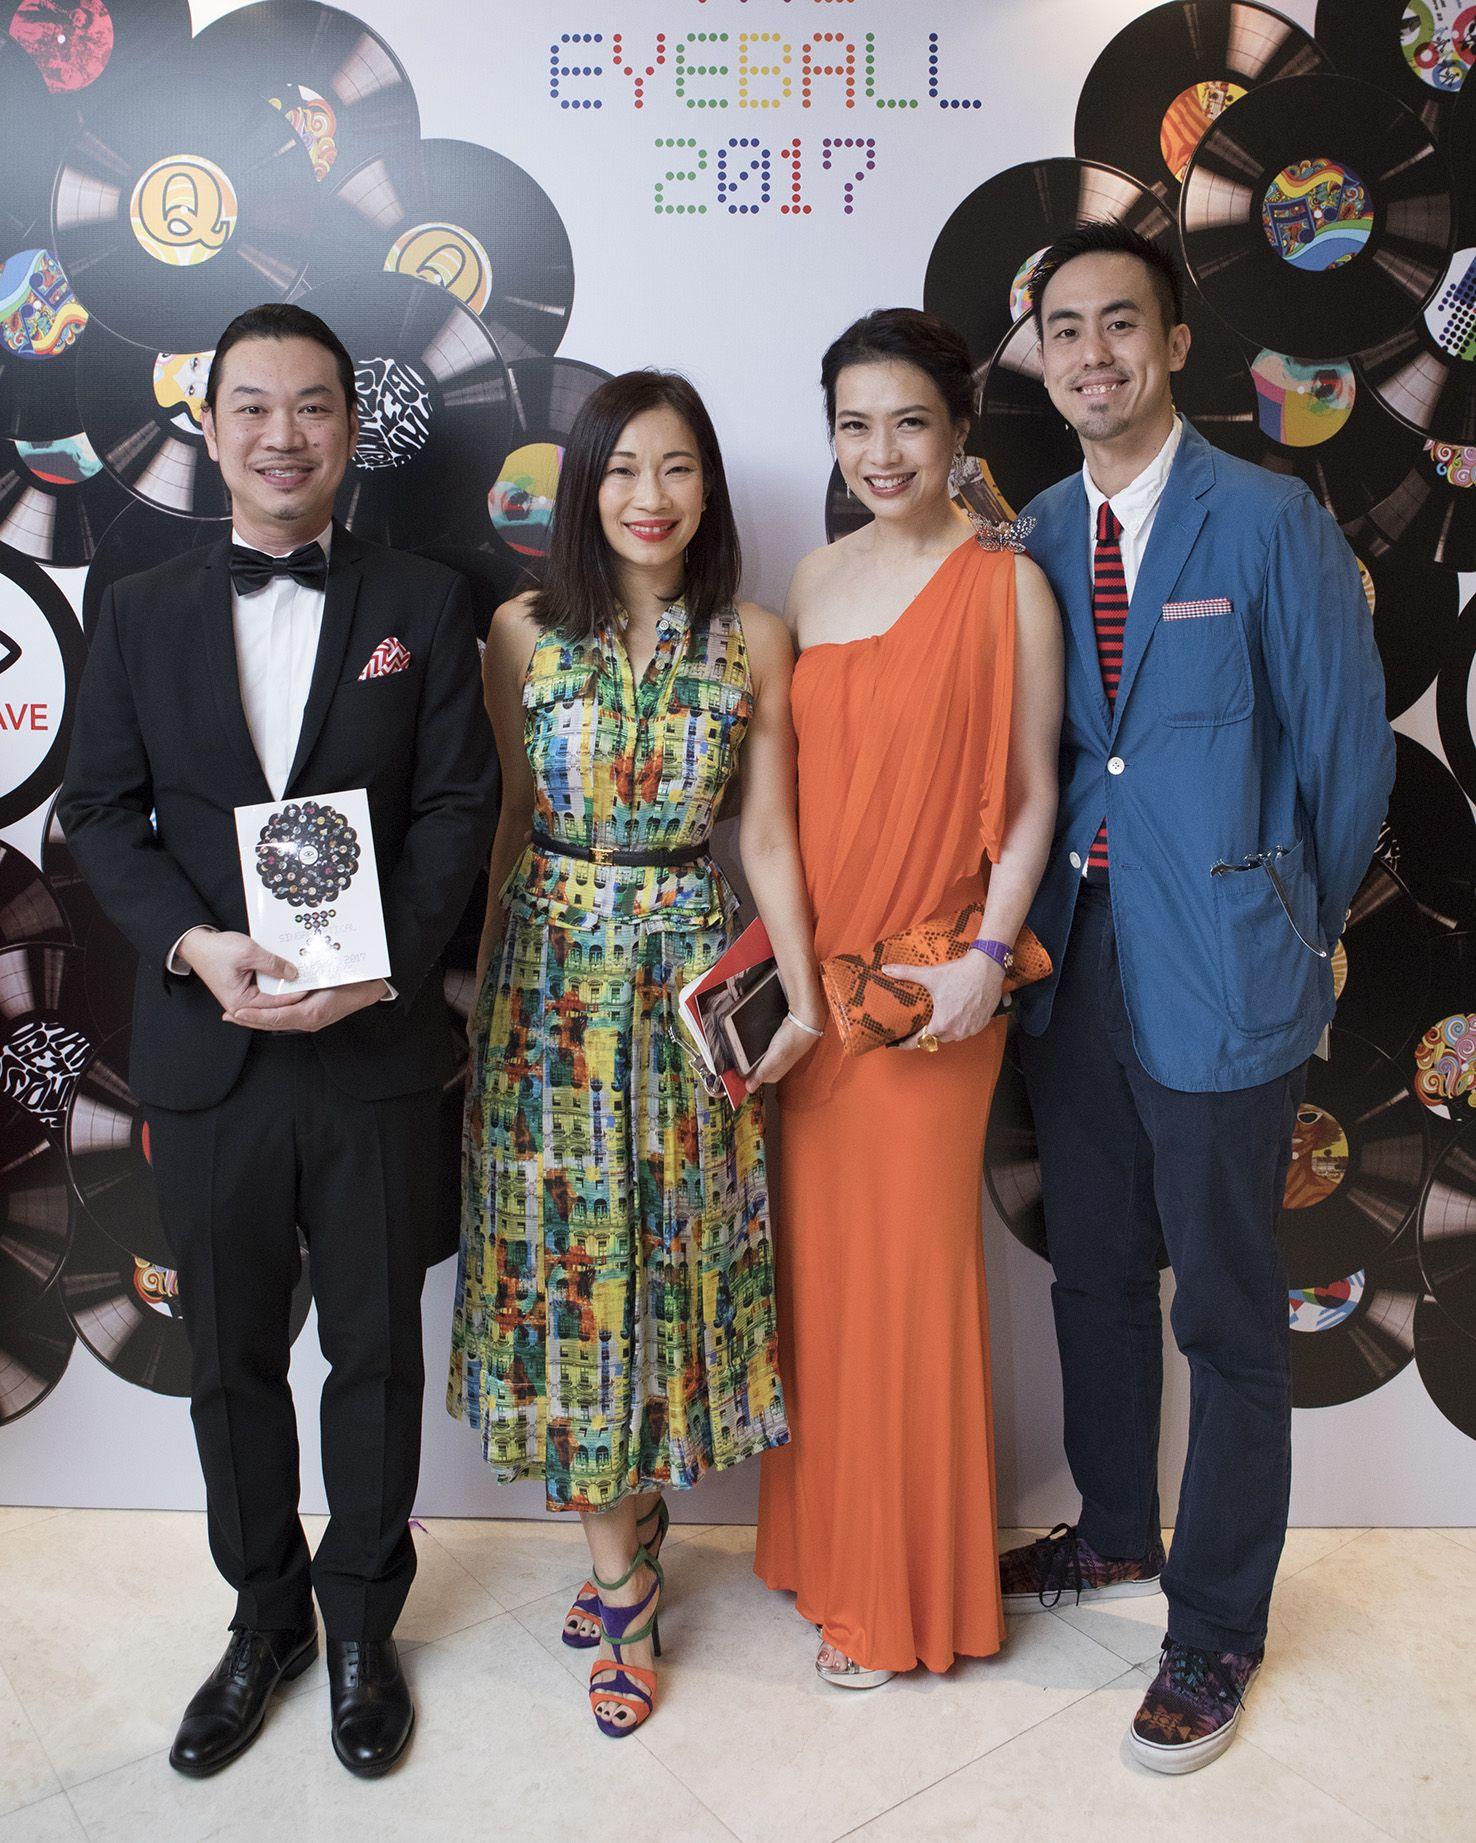 Desmond Lee, Corinne Ng, Ho Ching Lin, Terence Lim